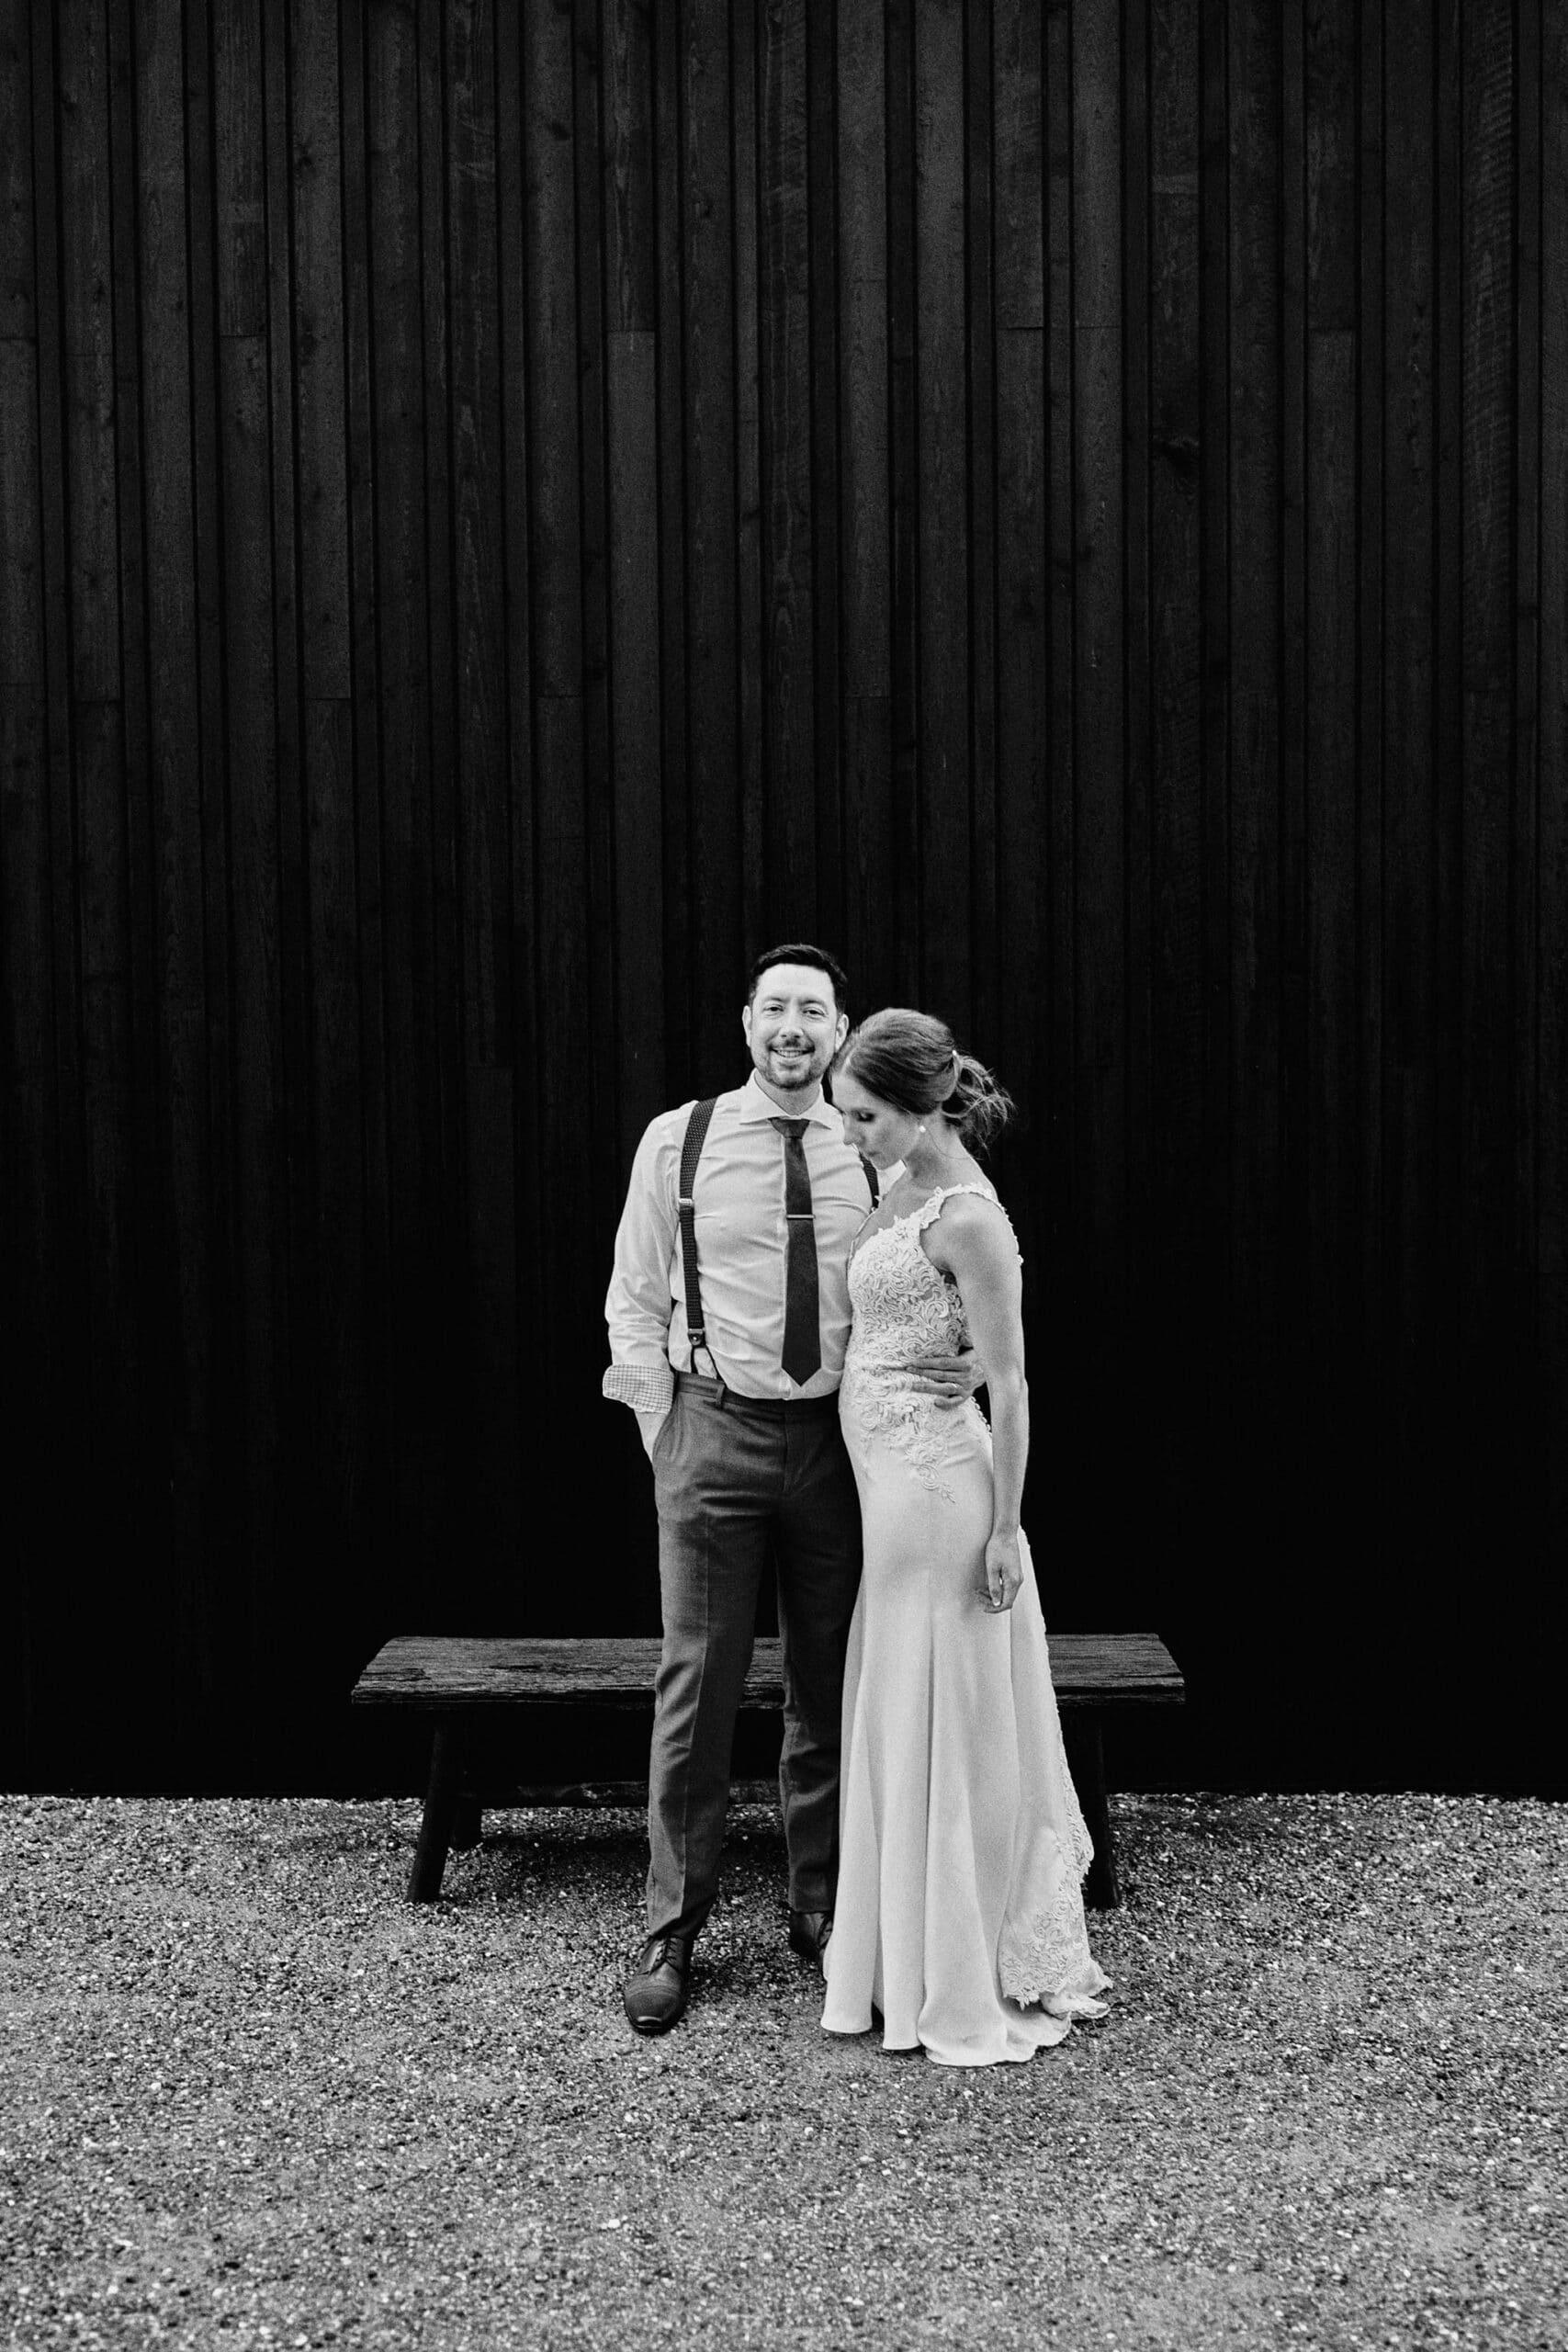 zonzo wedding photography reception post portrait